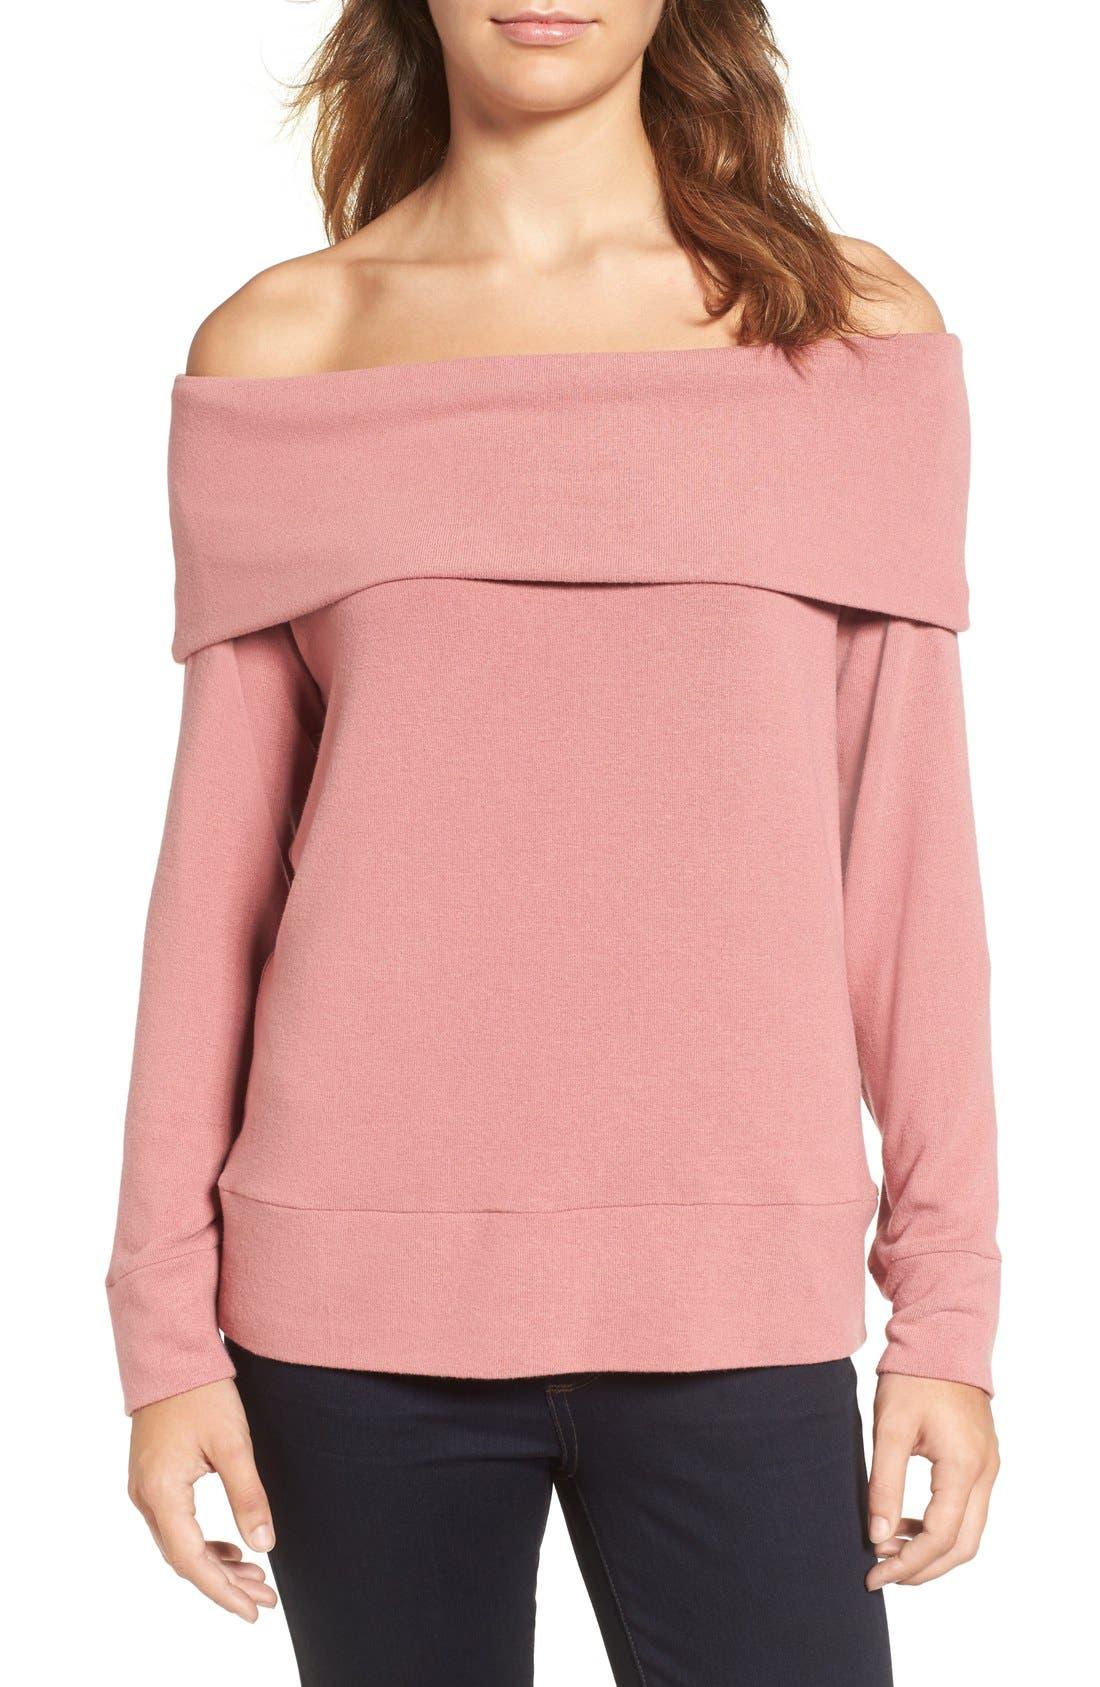 'Brooklyn' Off the Shoulder Top,                         Main,                         color, Cashew Pink